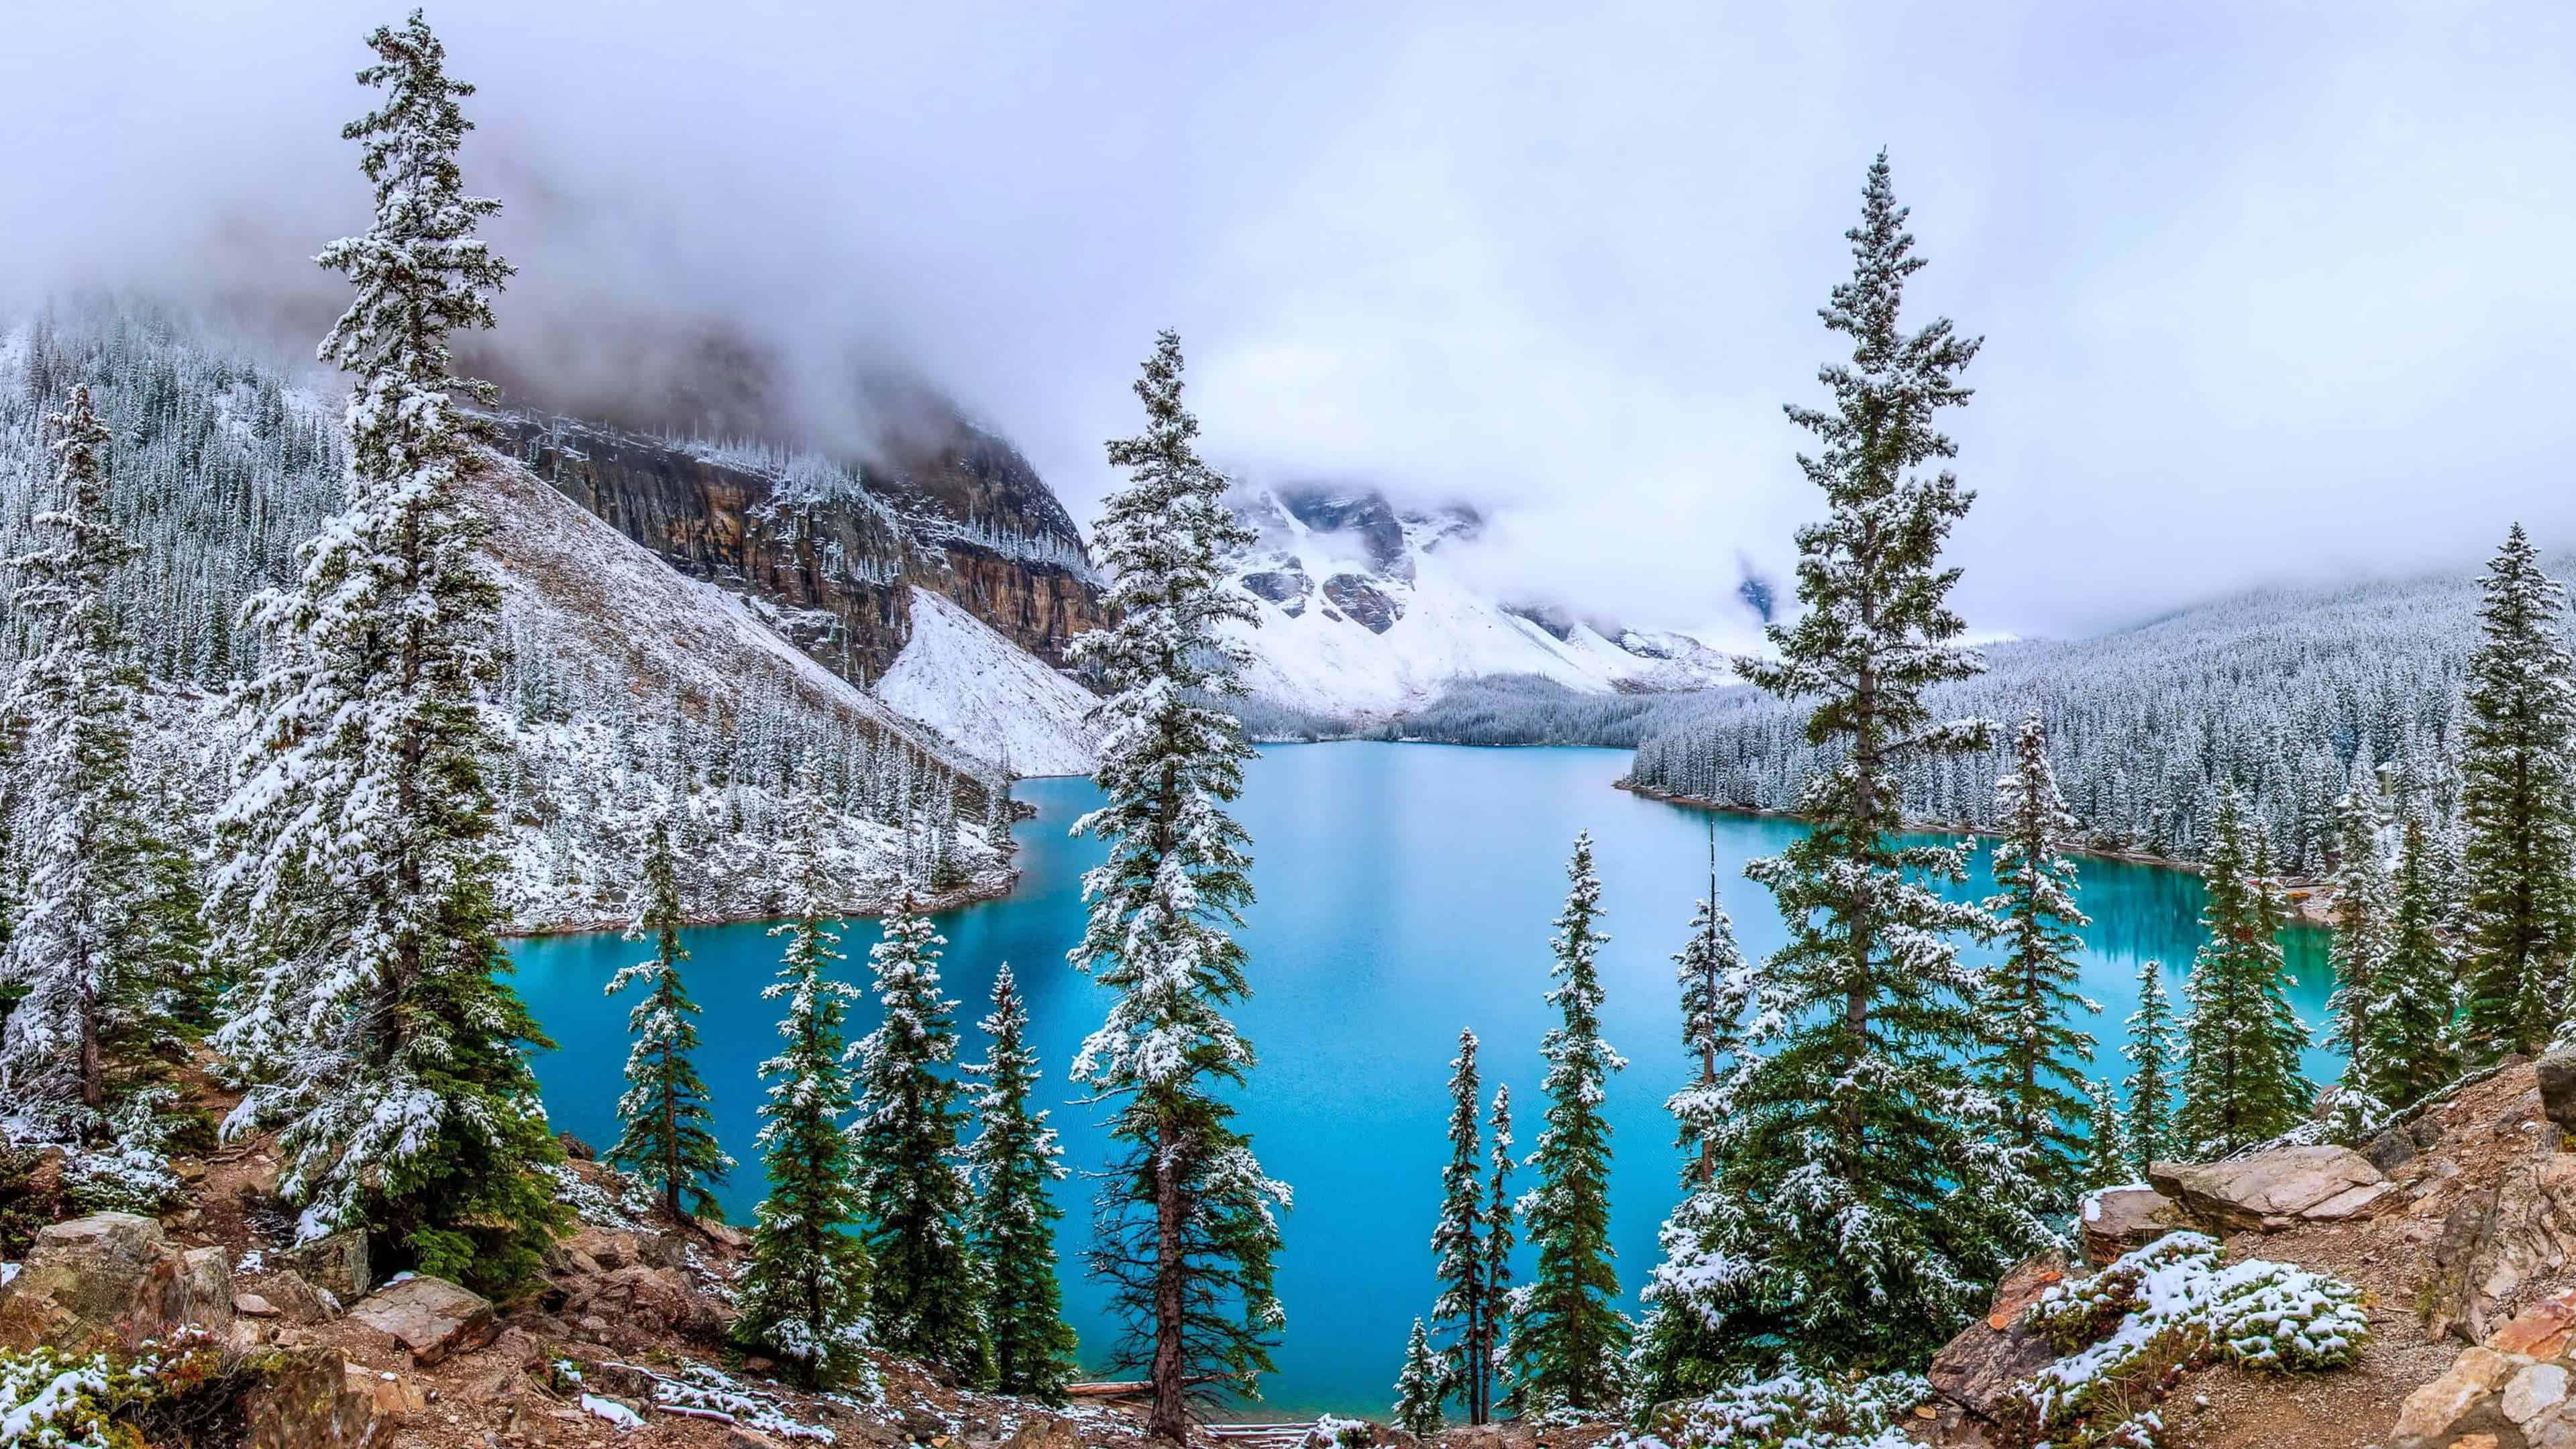 Moraine Lake, Banff, Canada UHD 4K Wallpaper